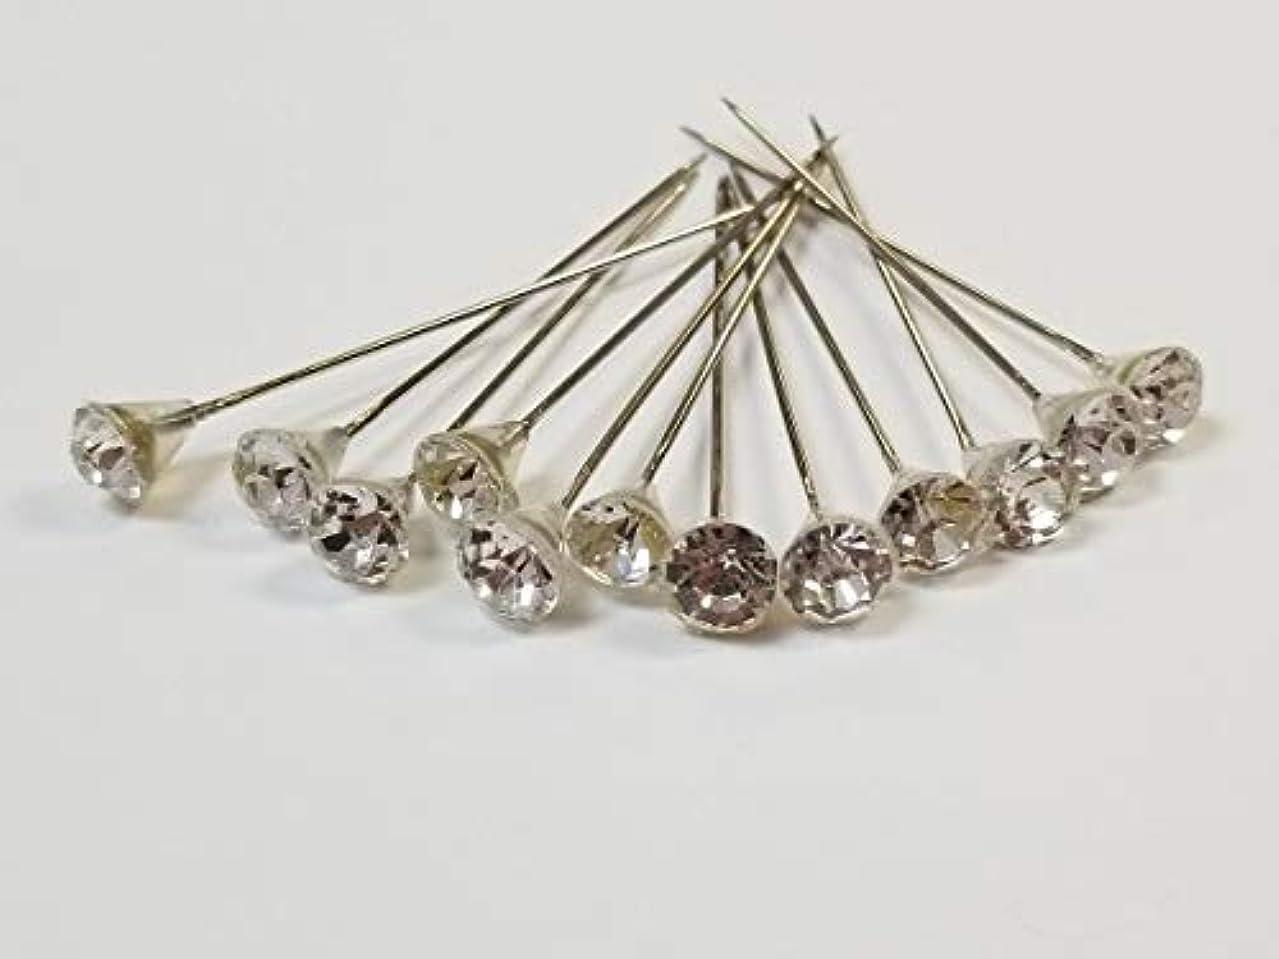 Corsage Pins - Rhinestone Corsage Pin - Crystal